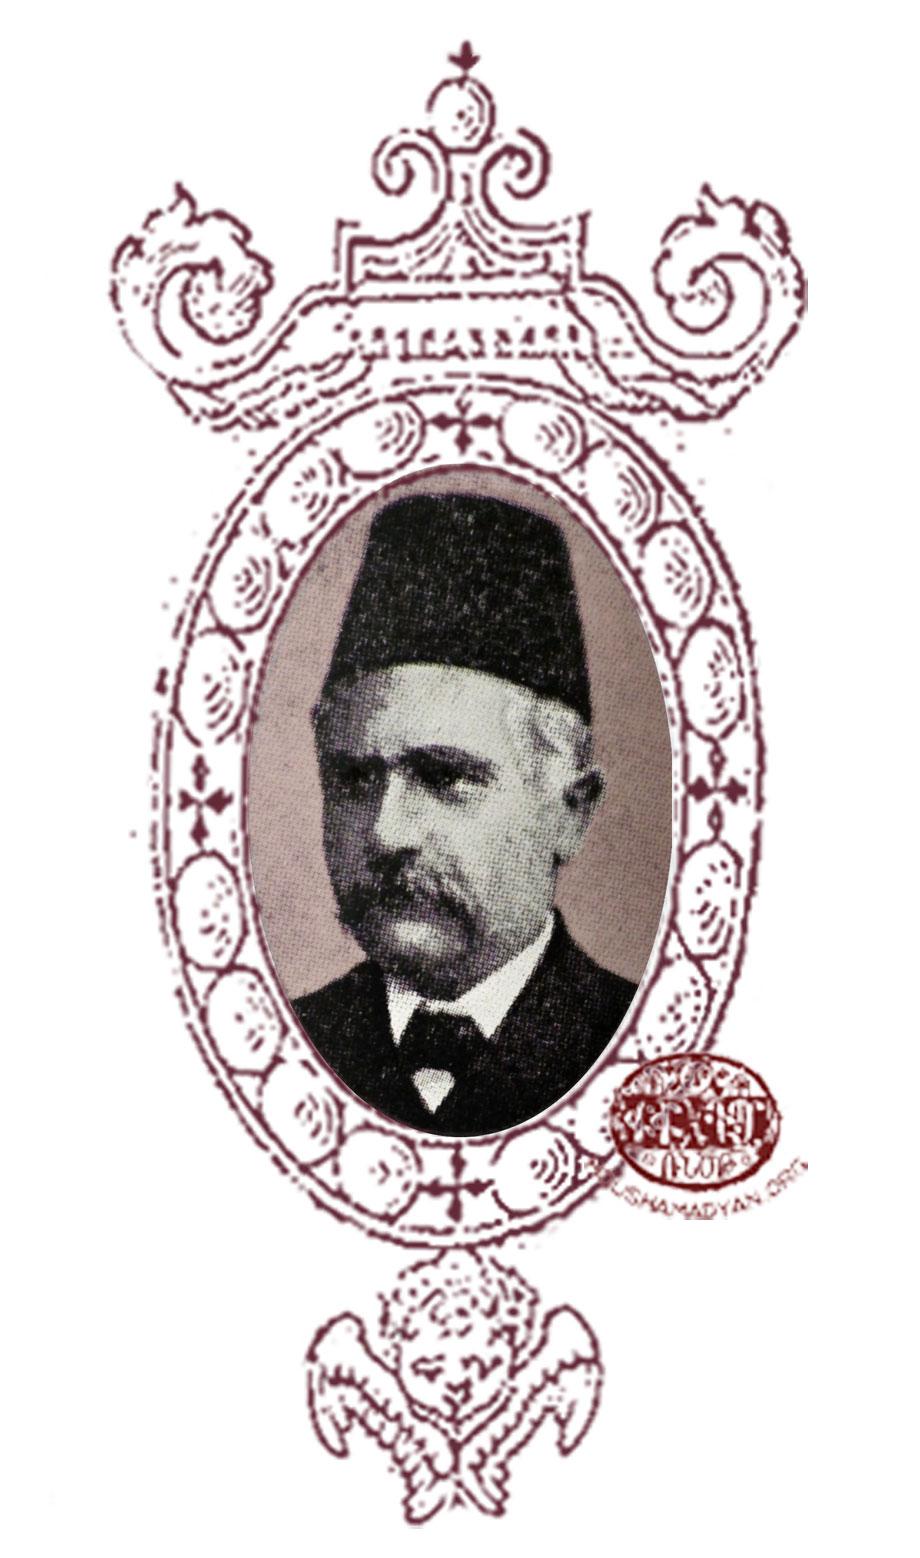 Khachadour Nahigian